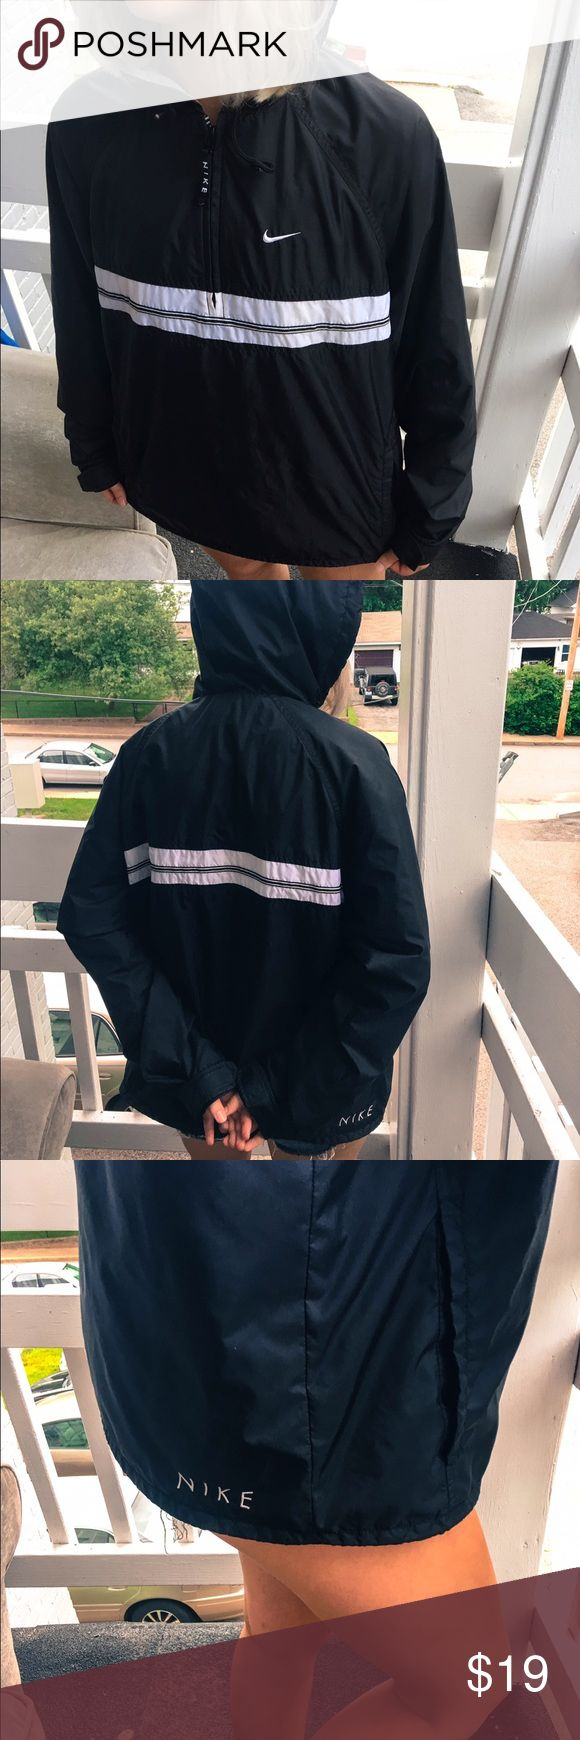 Nike windbreaker Men's medium / worn a couple times / message me if you have questions Nike Jackets & Coats Windbreakers